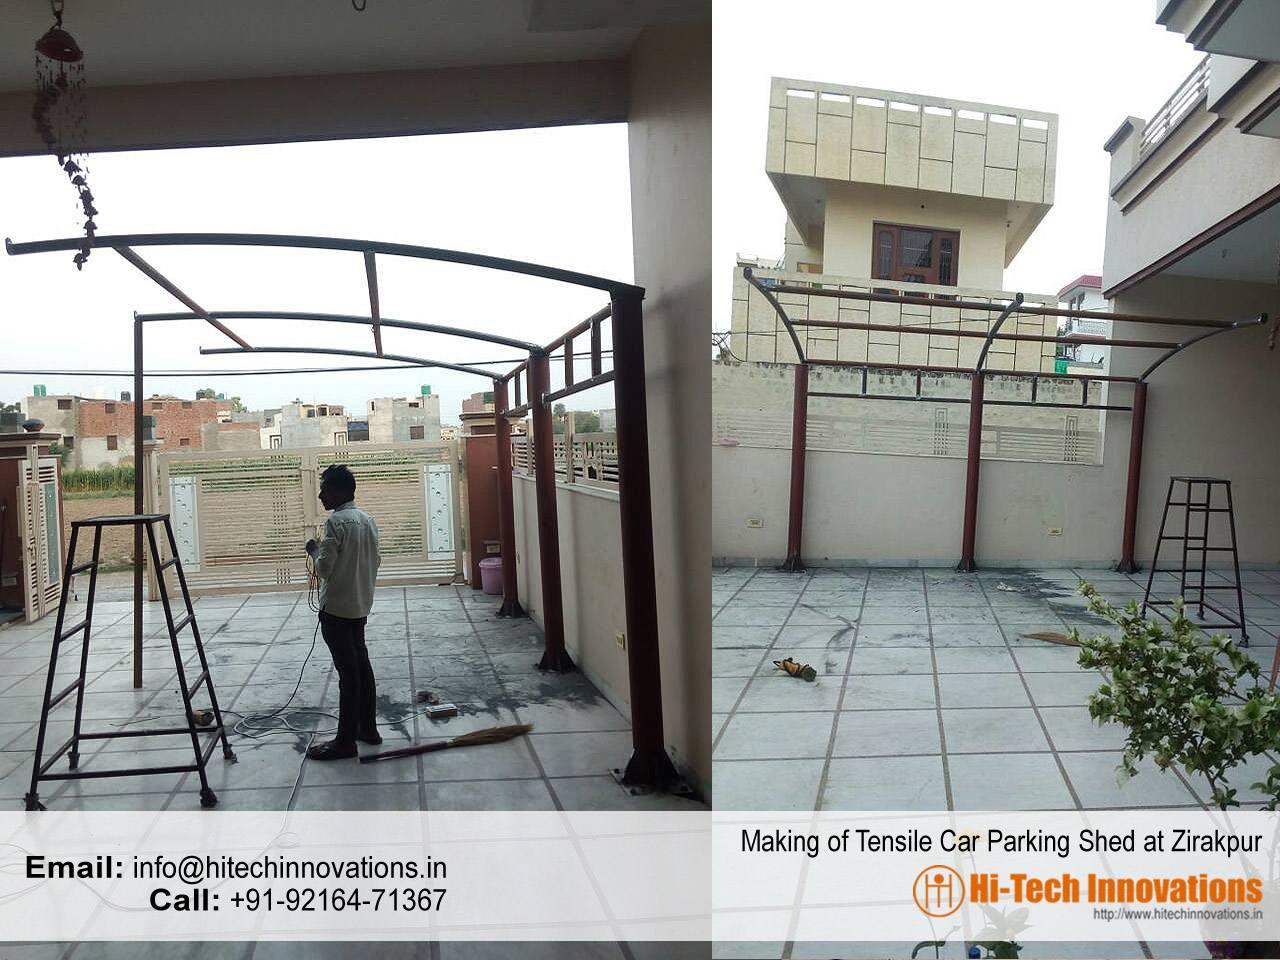 Tensile Car Parking Shed Zirakpur